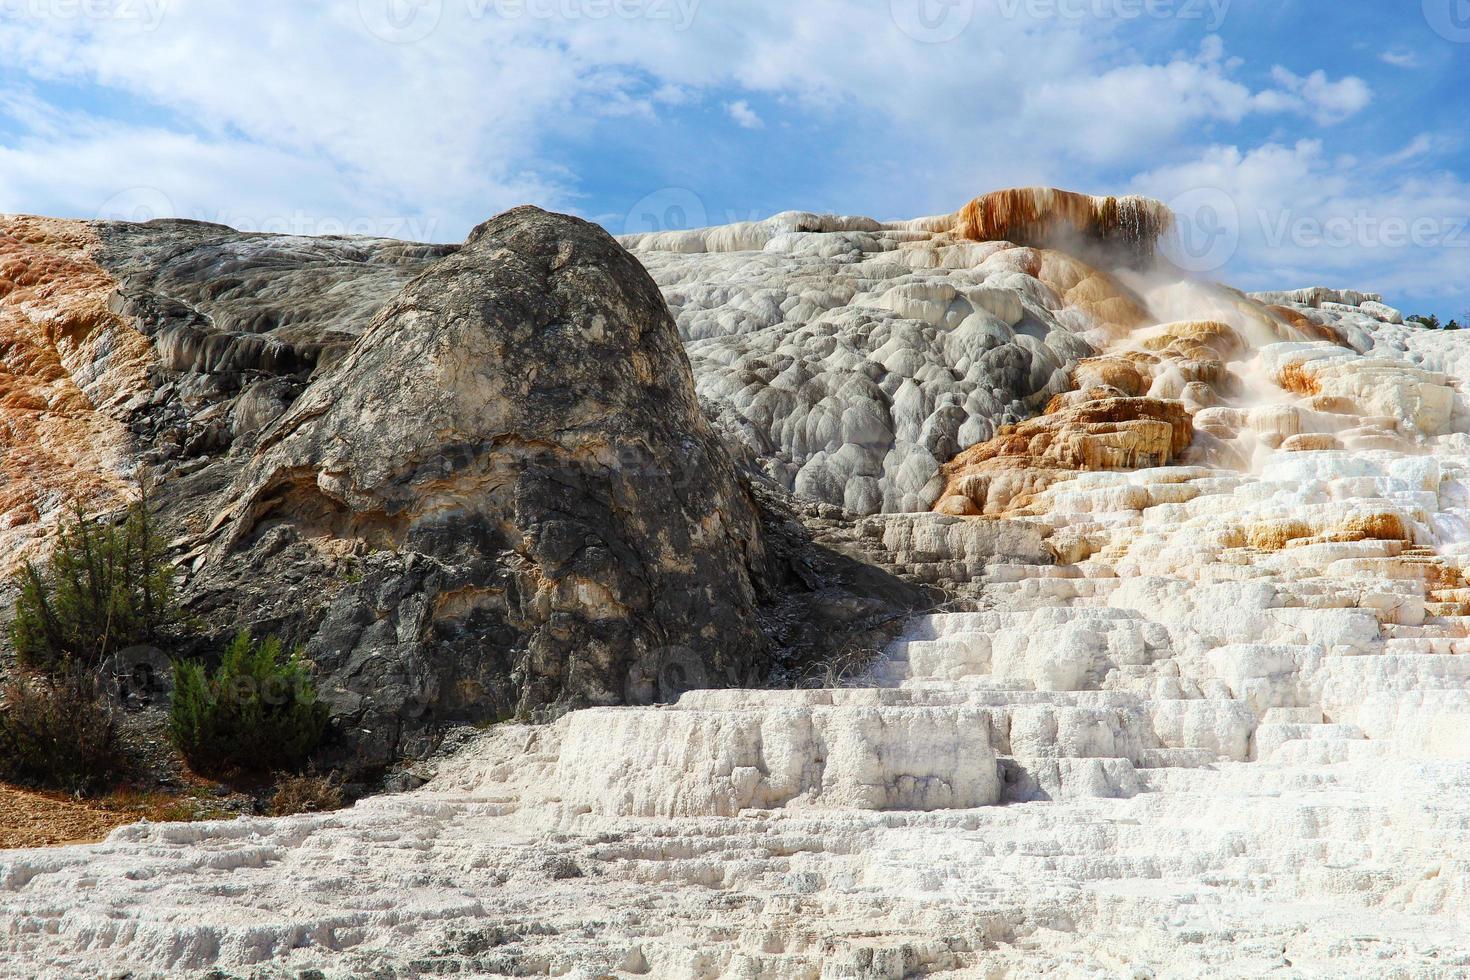 Yellowstone National Park, Mammoth Hot Springs photo